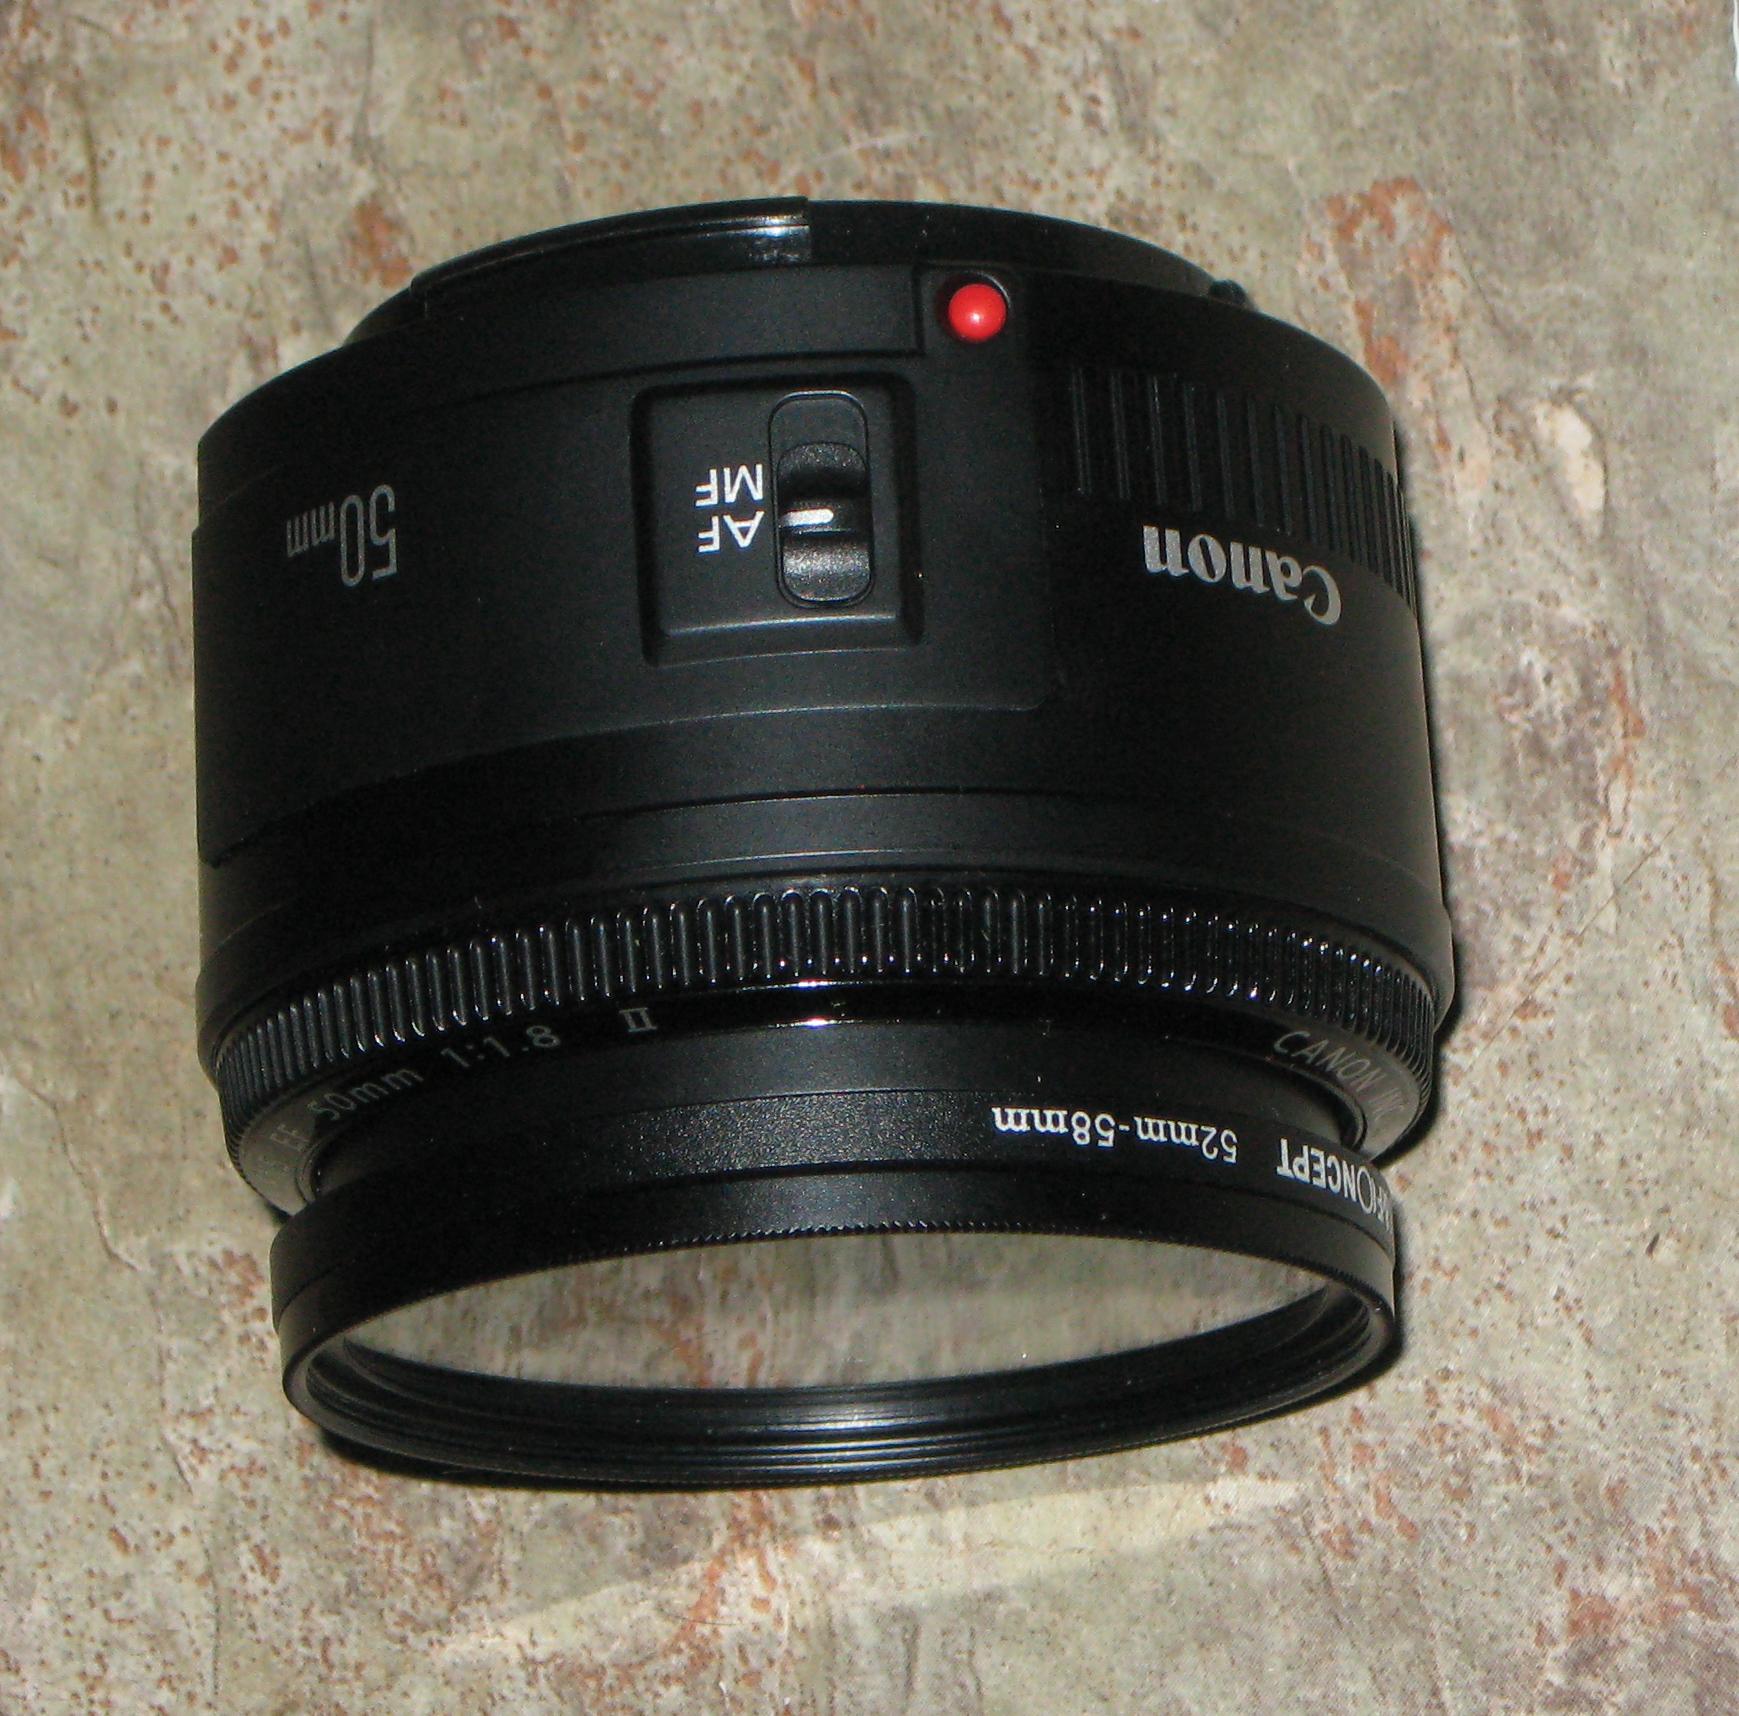 Review - The Canon EF 50mm f/1.8 II Lens - Random Bits